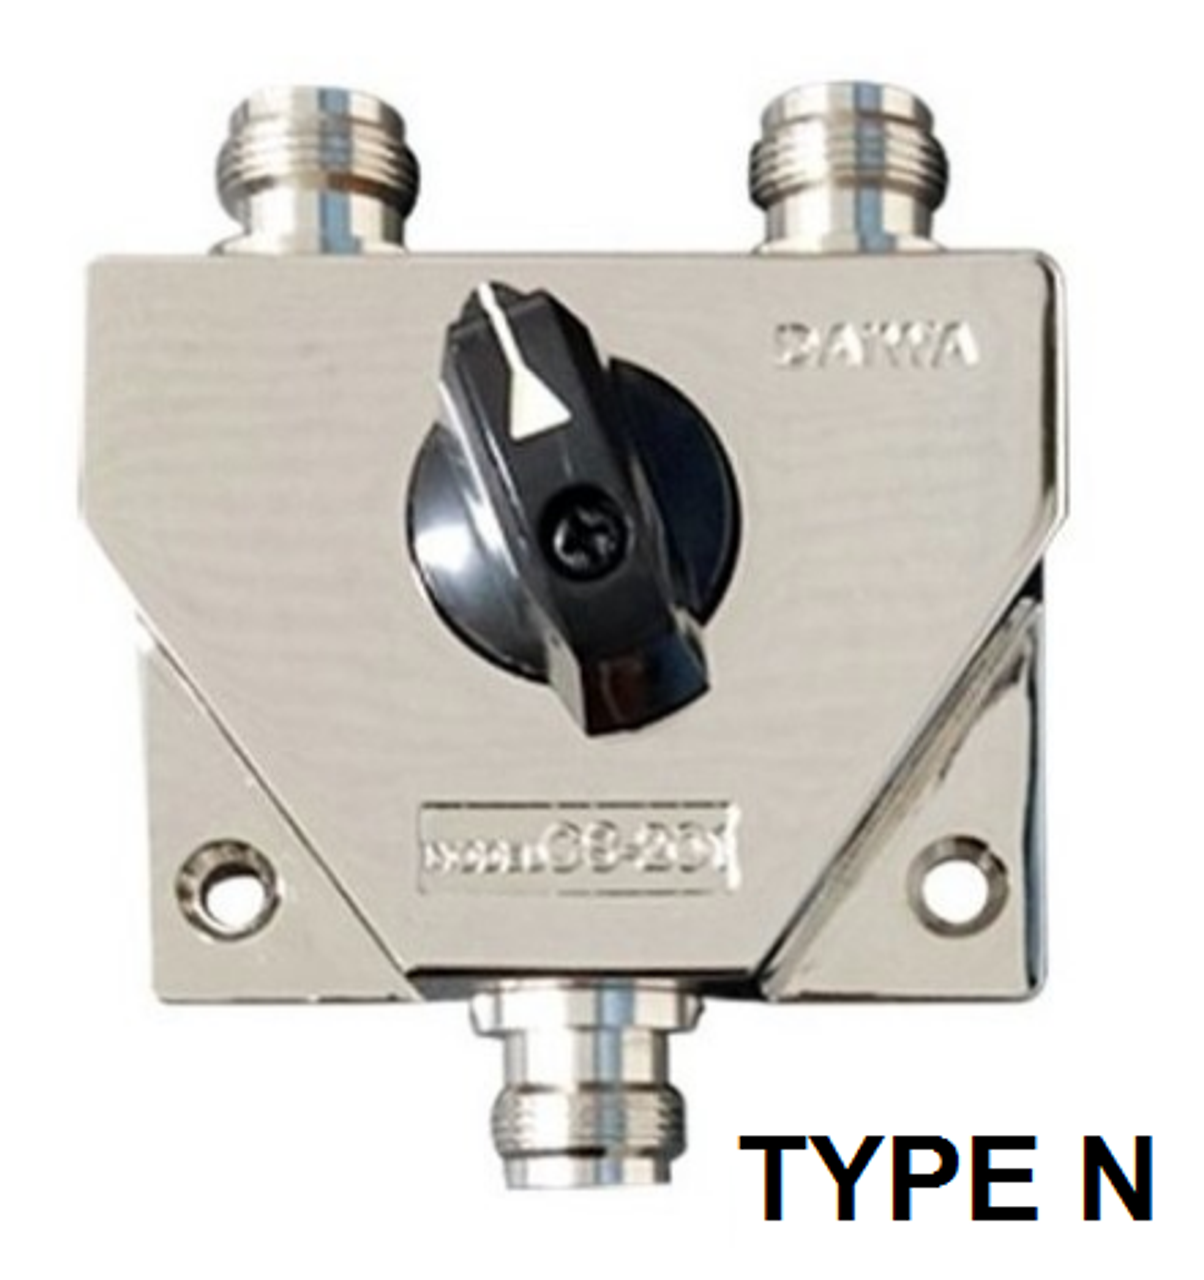 Daiwa CS-201GII - 2-Position Coax Switch Type N Female Connectors